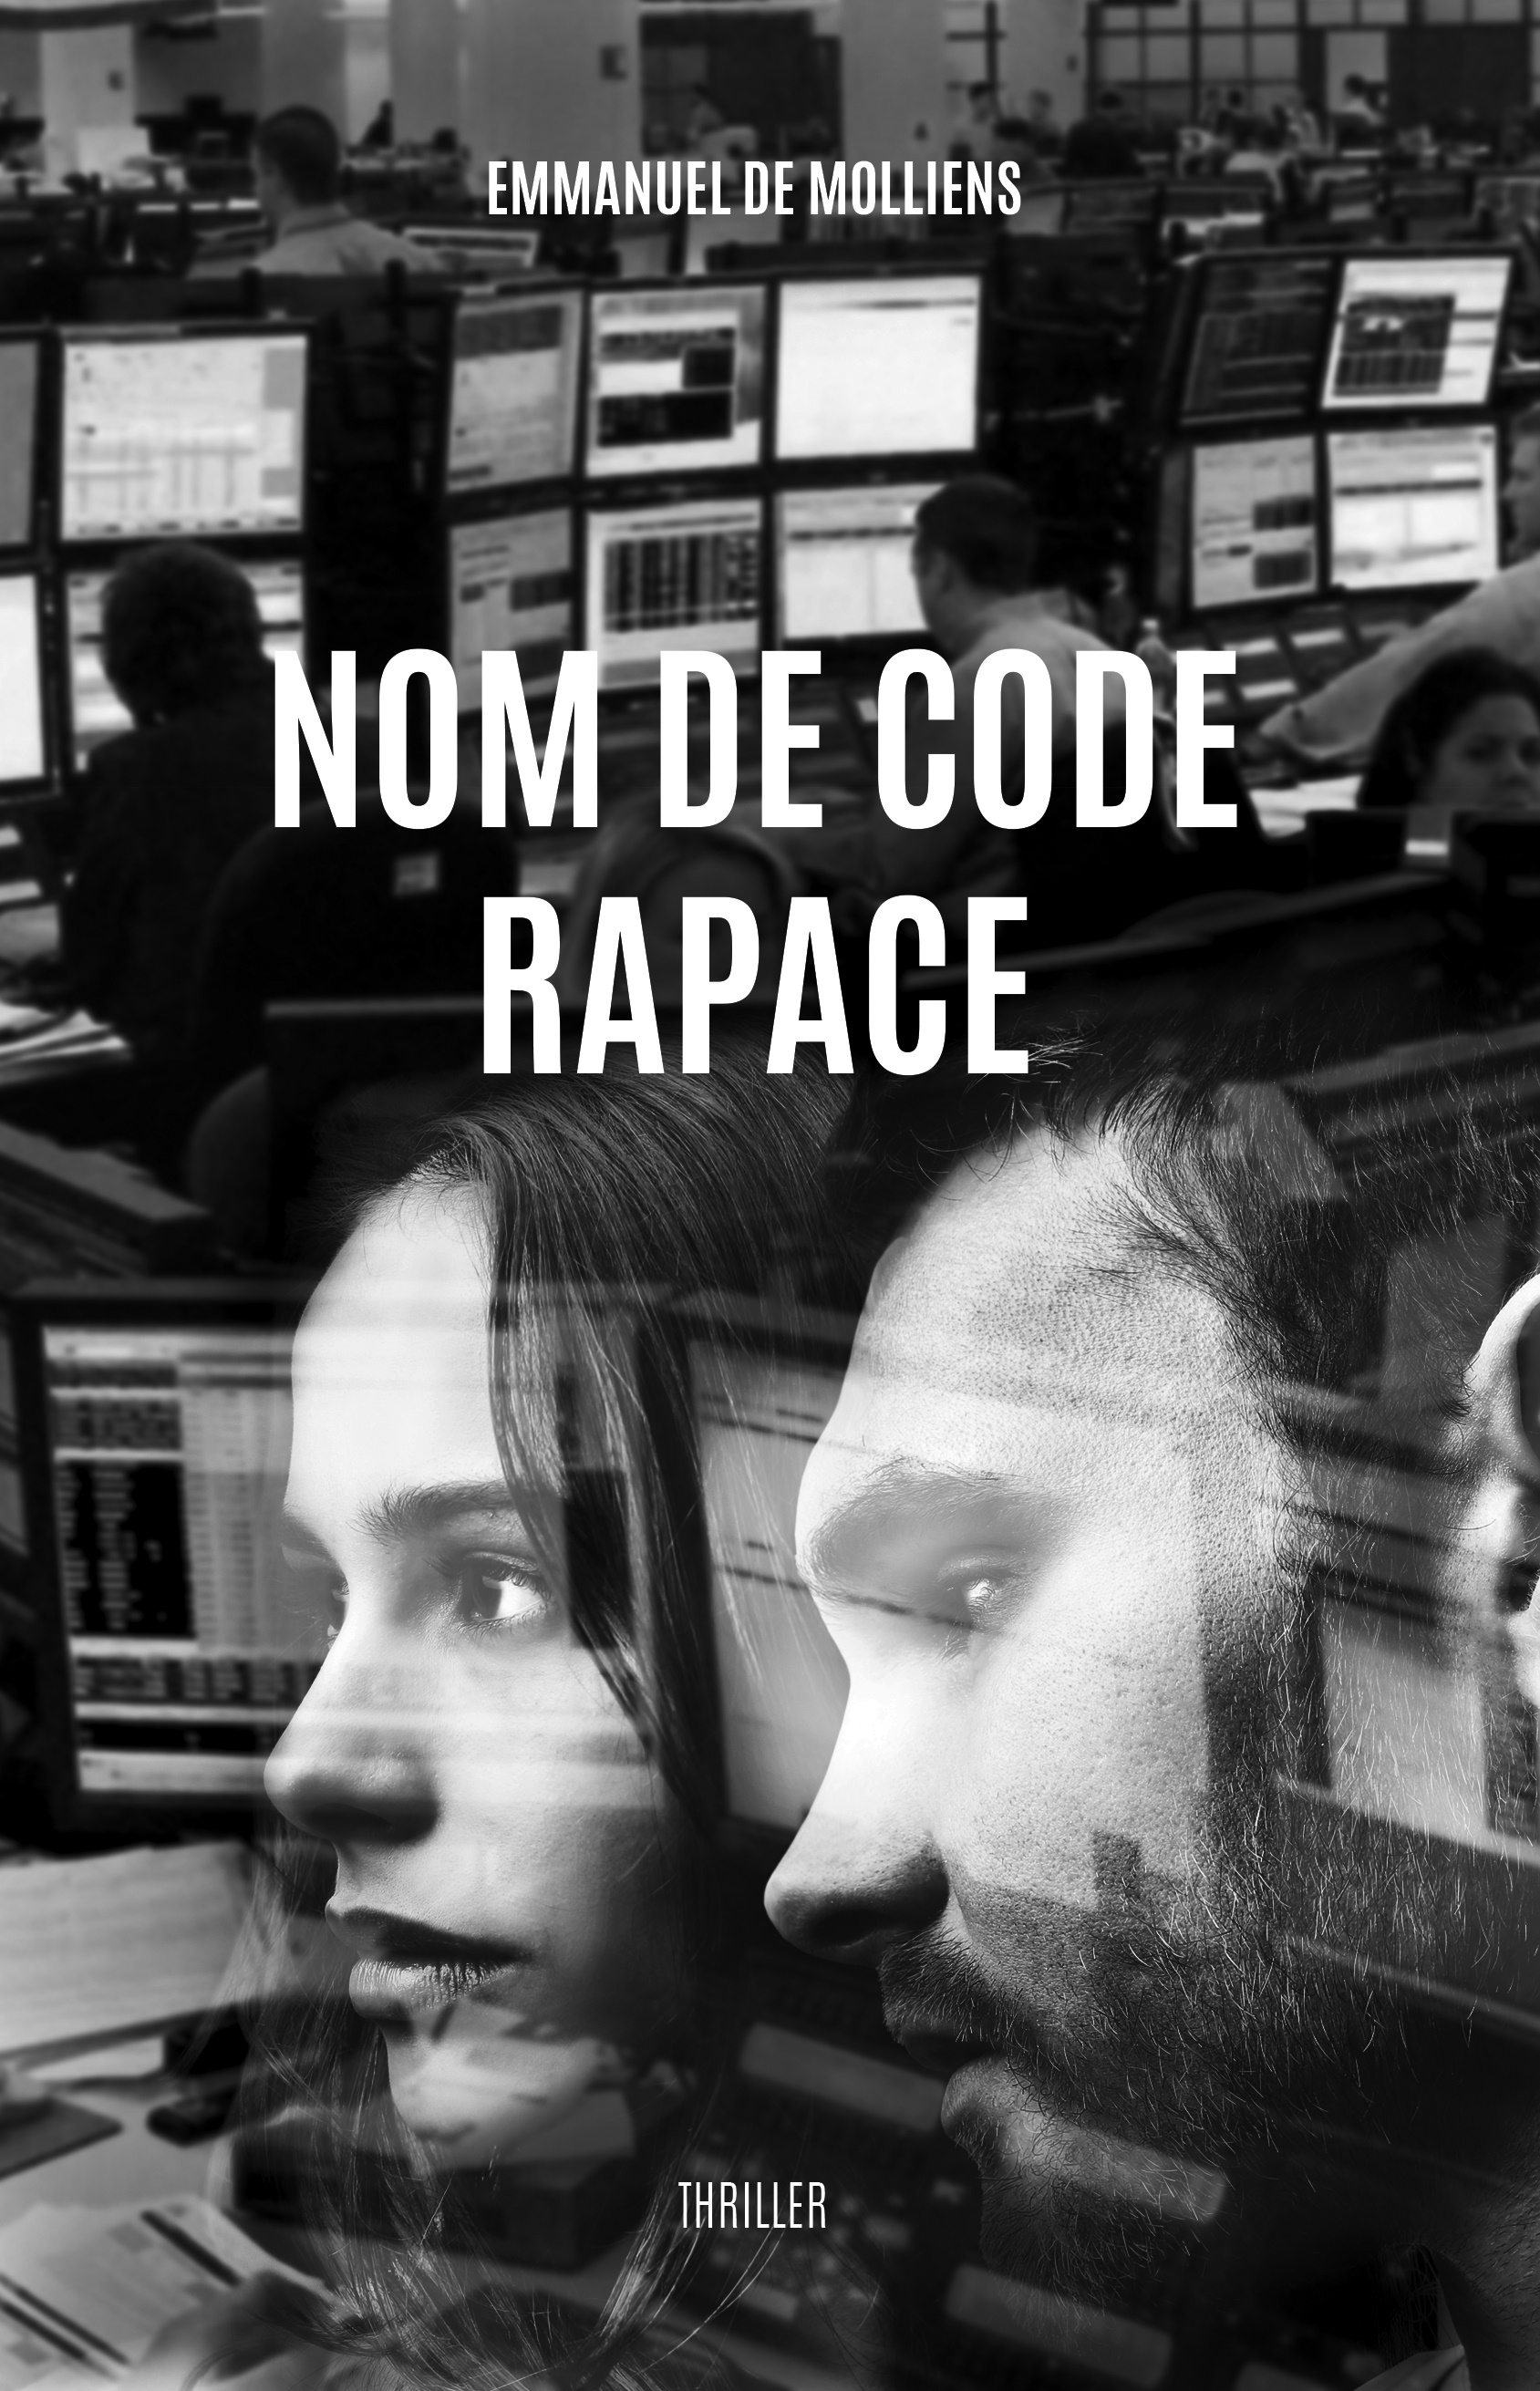 NOM DE CODE RAPACE